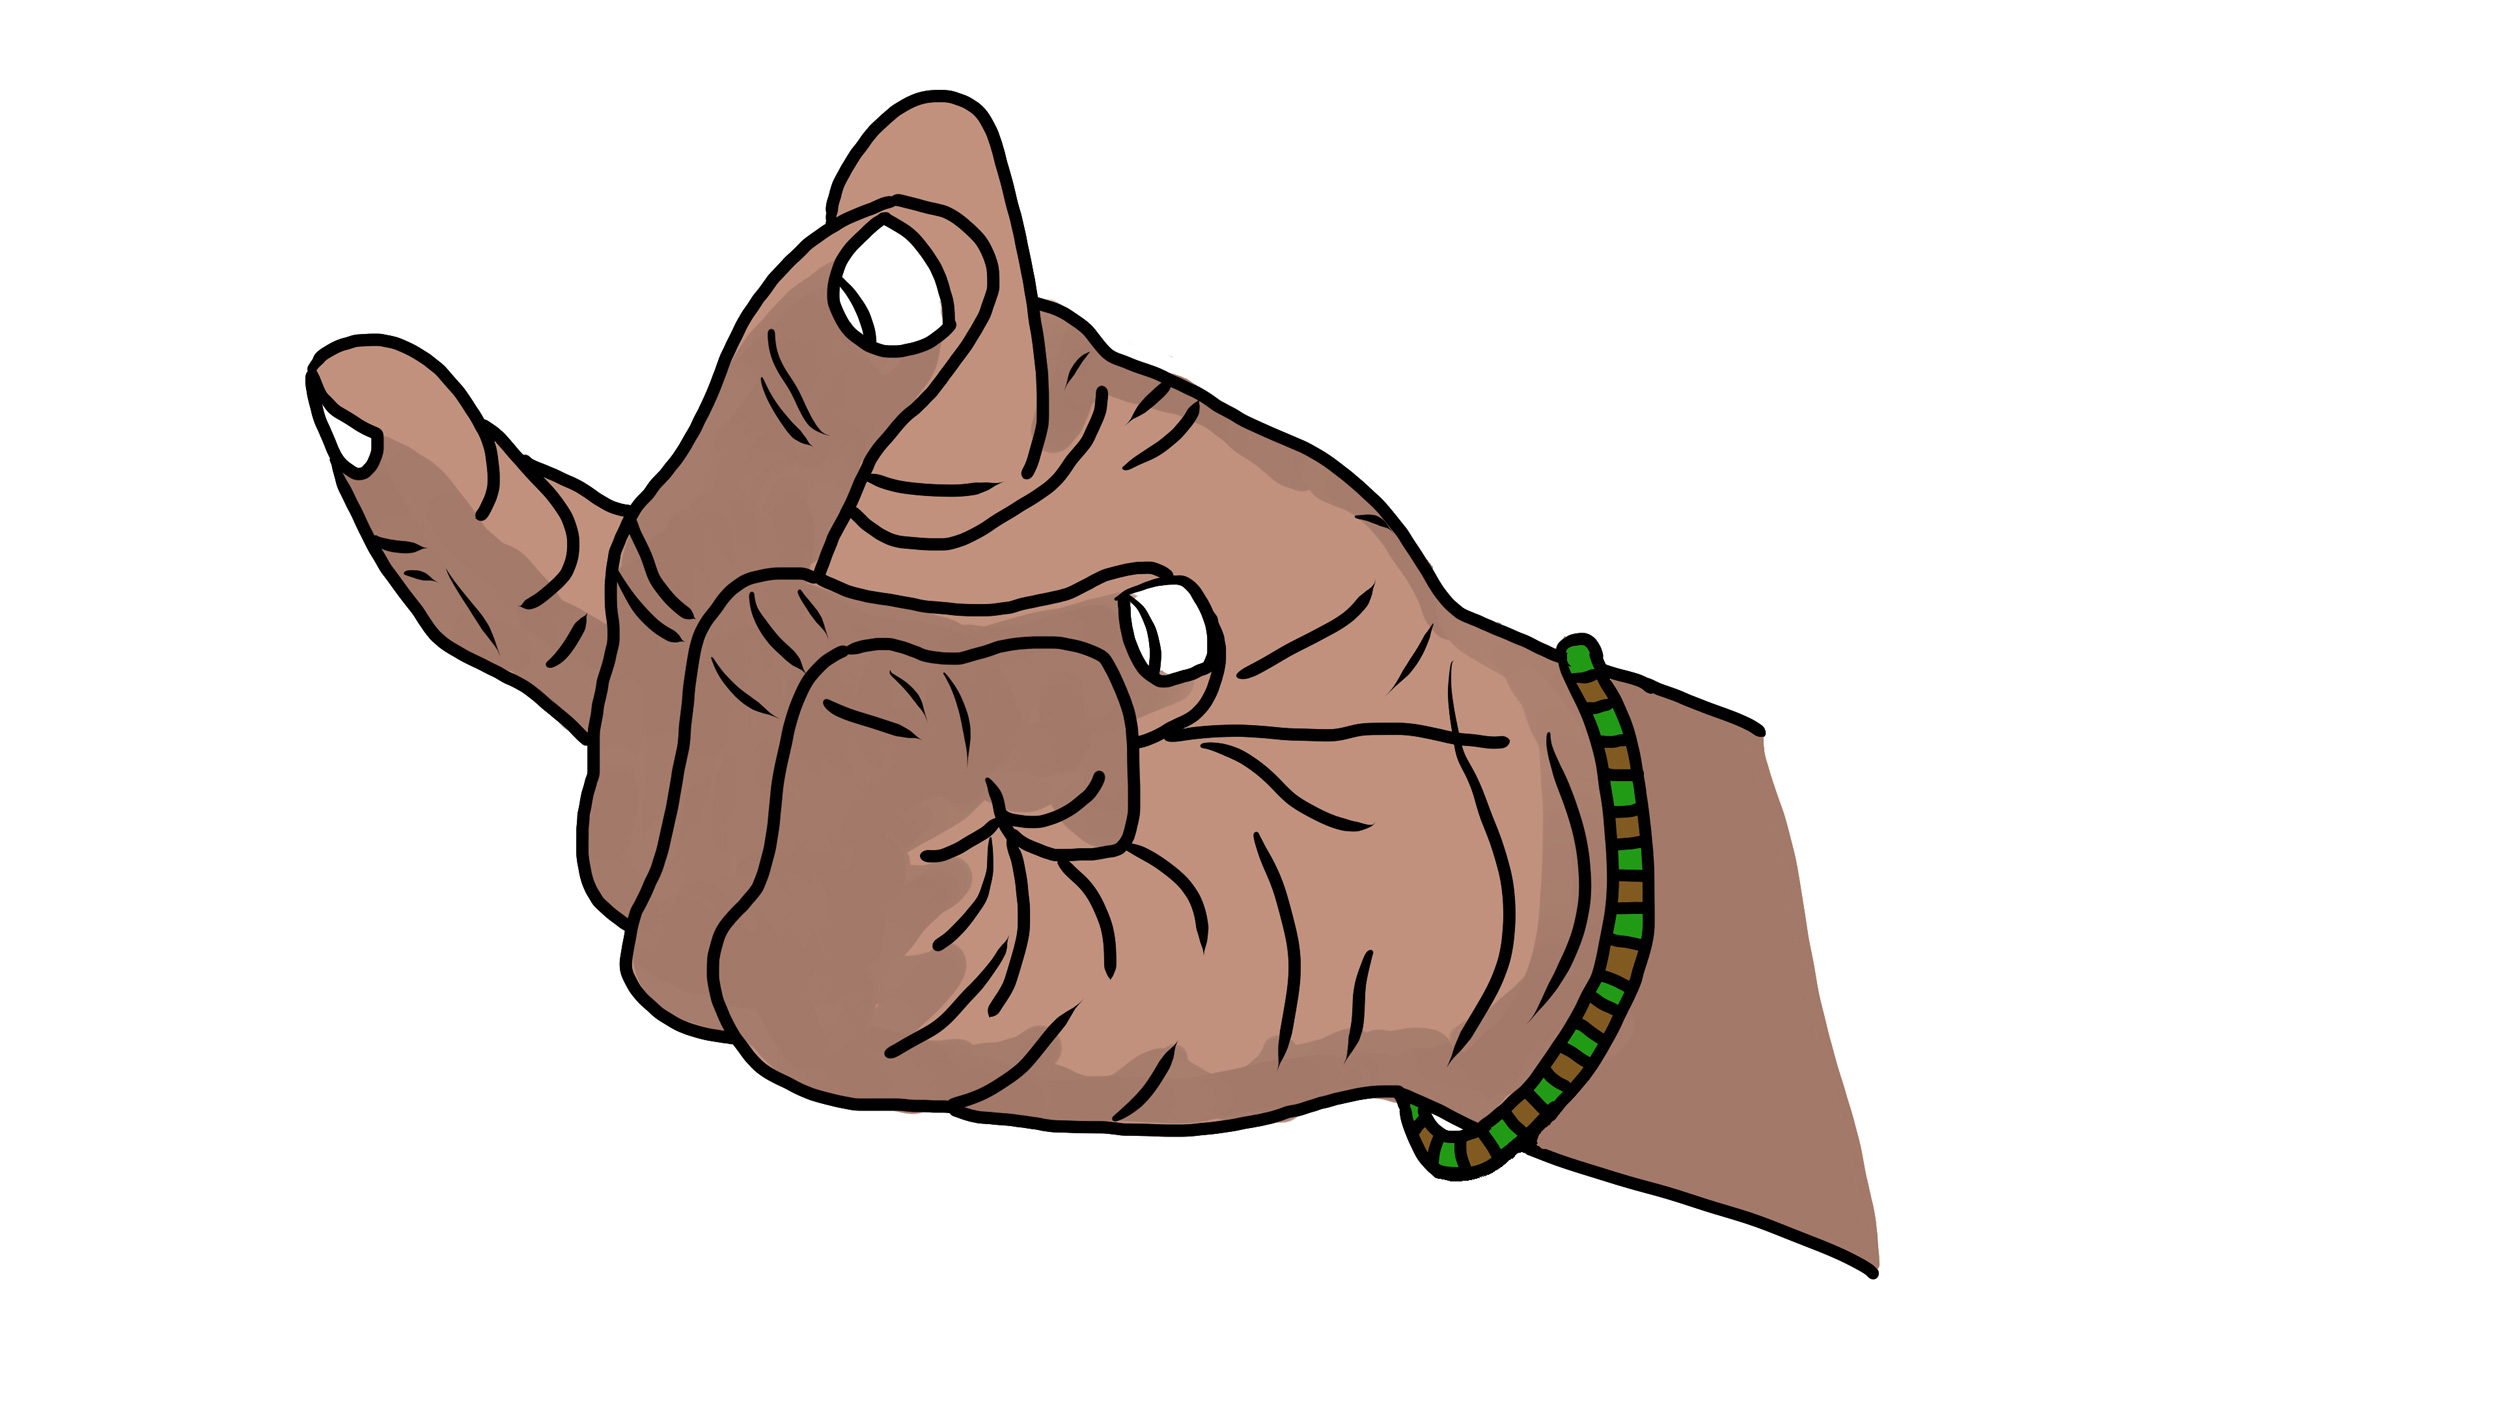 taka, finger snapping, osi danun, yoruba, orisha, kosi iku, kosi arun, kosi ofo, lukumi, orisha prayer, adura orisa